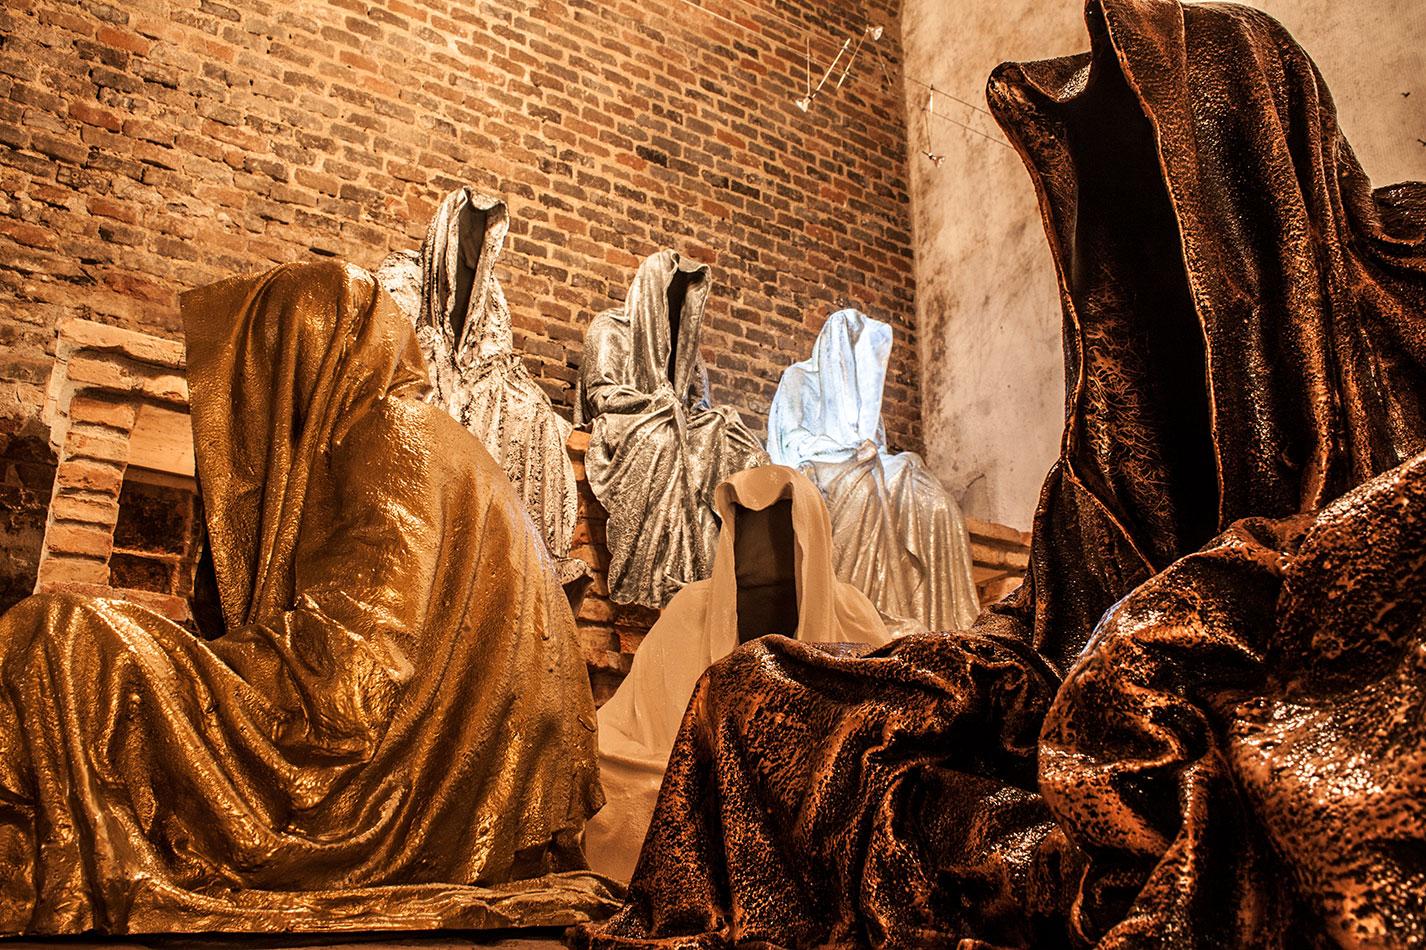 wine-cellar-galerie-artdealer--freller-guardians-of-time-manfred-kili-kielnhofer-contemporary-art-arts-light-design-sculpture-antique-show-statue-7907